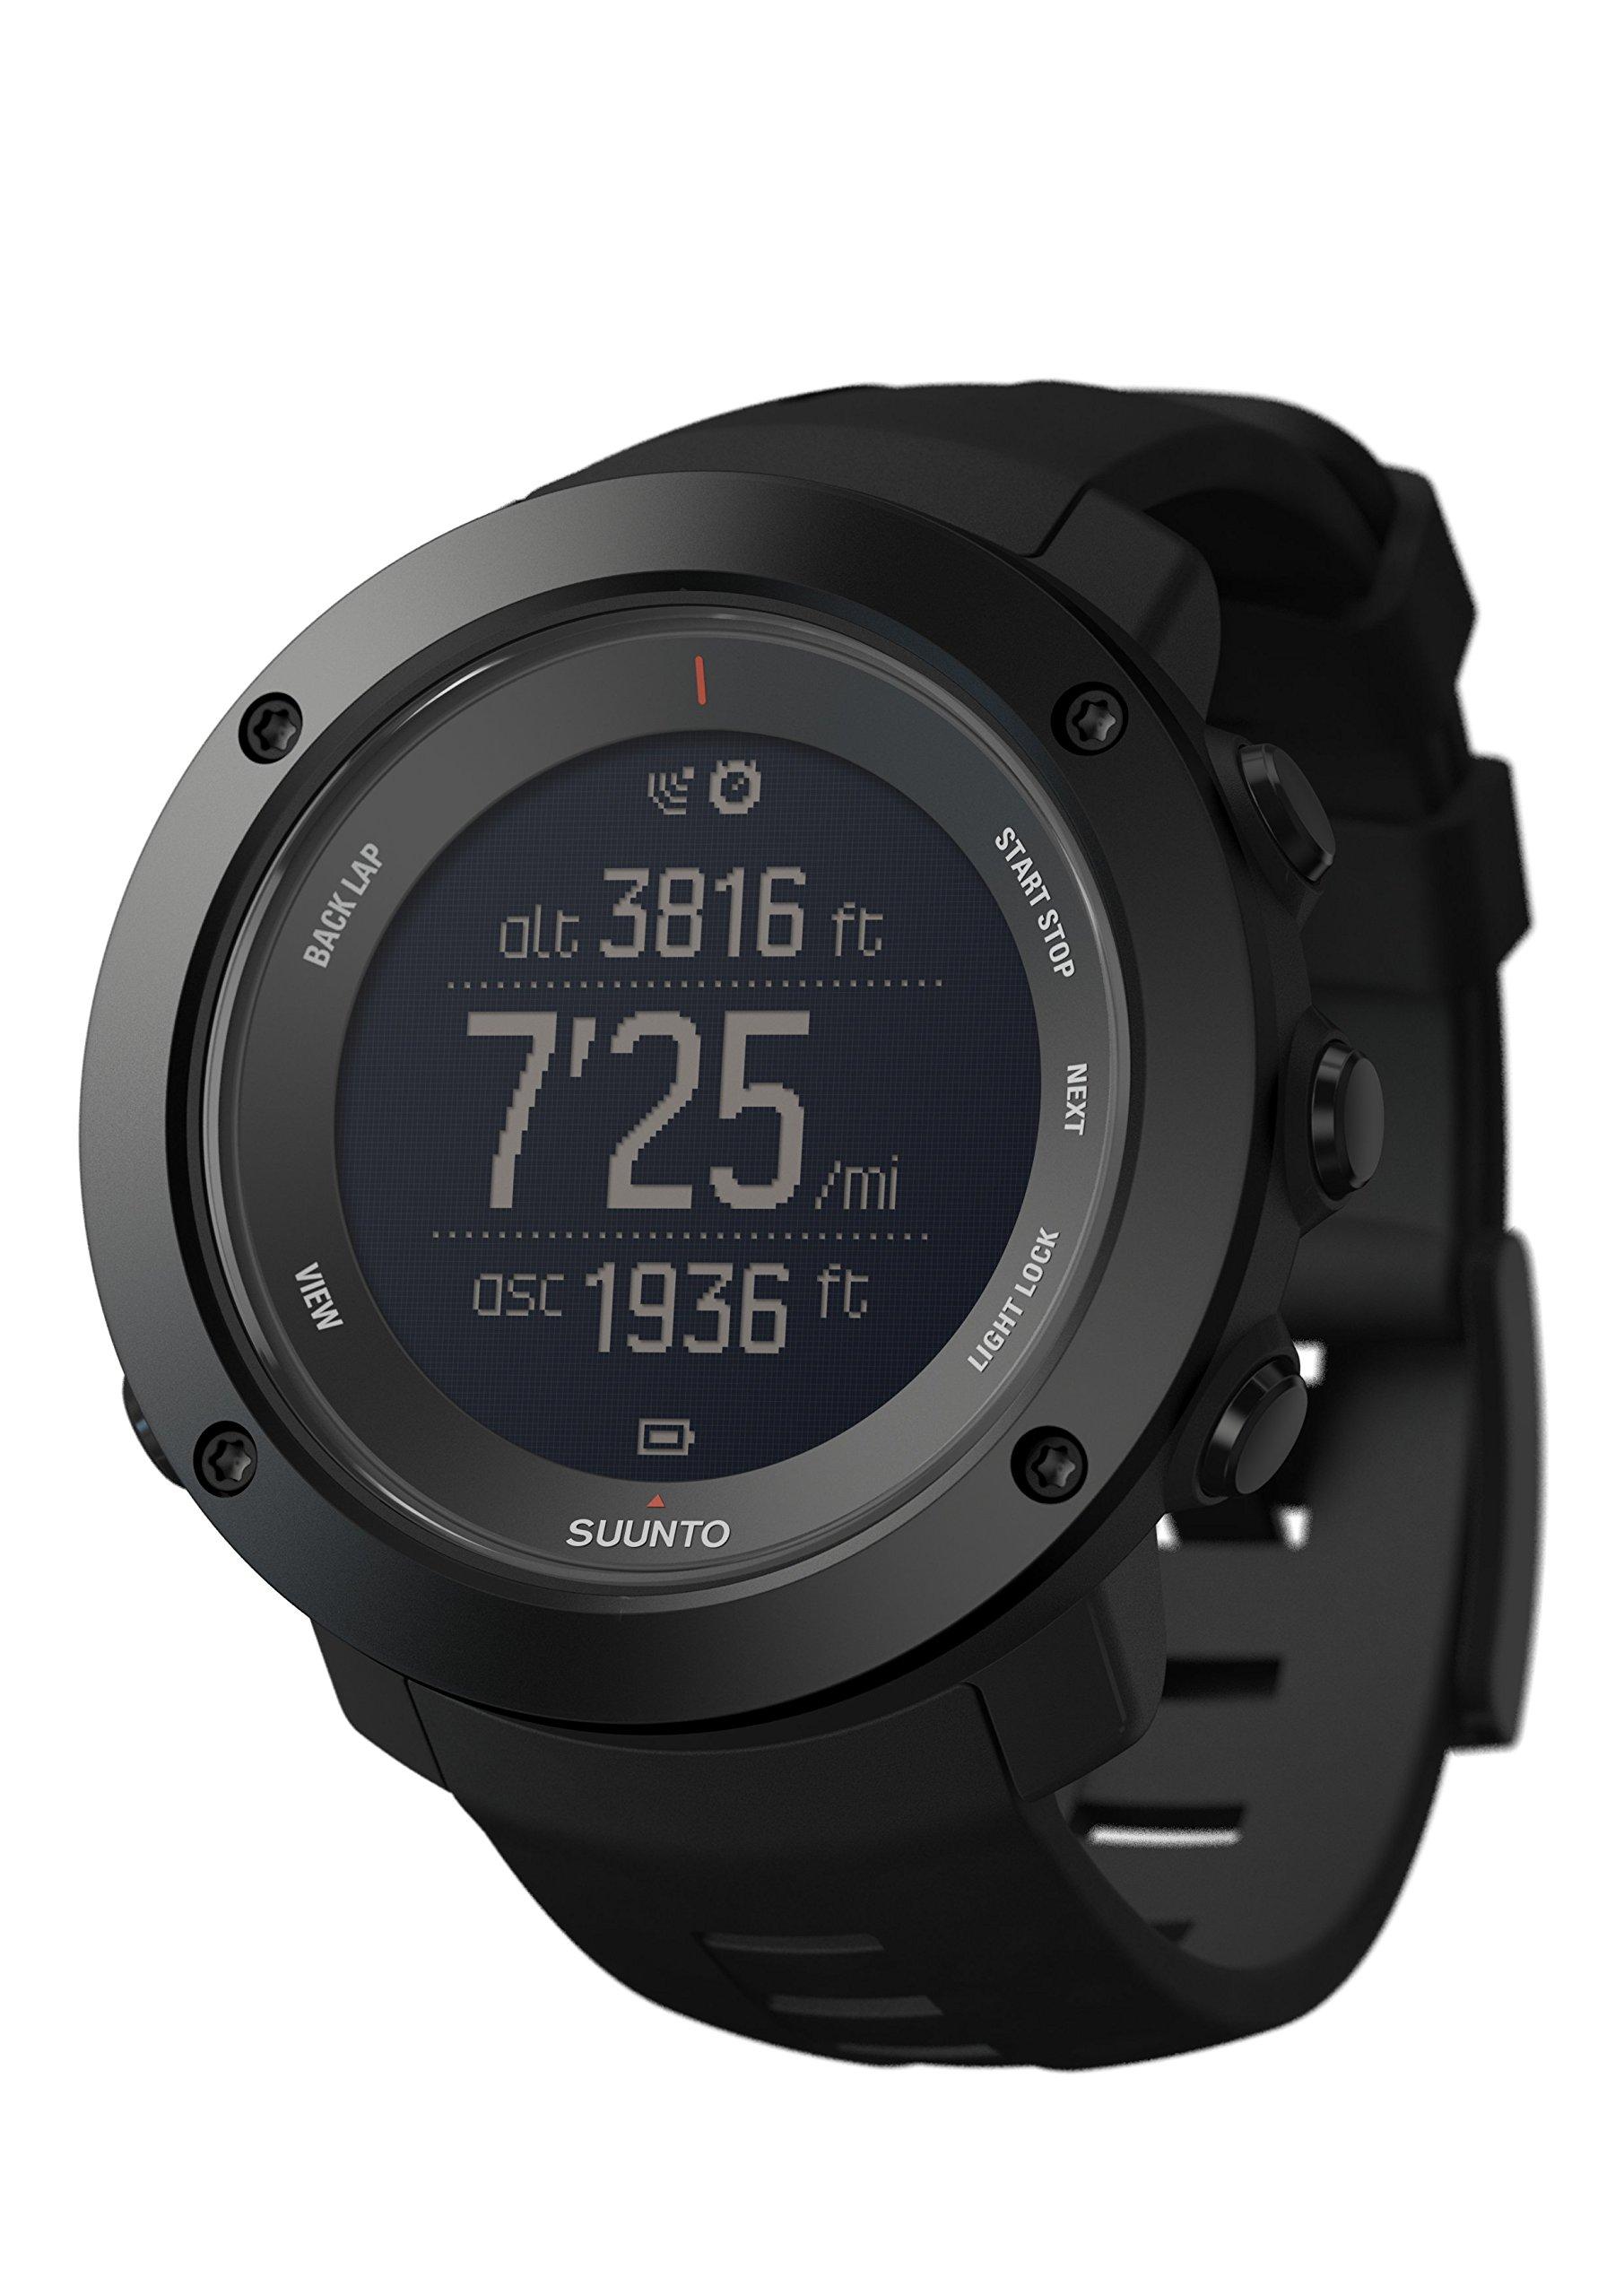 Suunto Ambit3 Vertical Running GPS Unit, Black